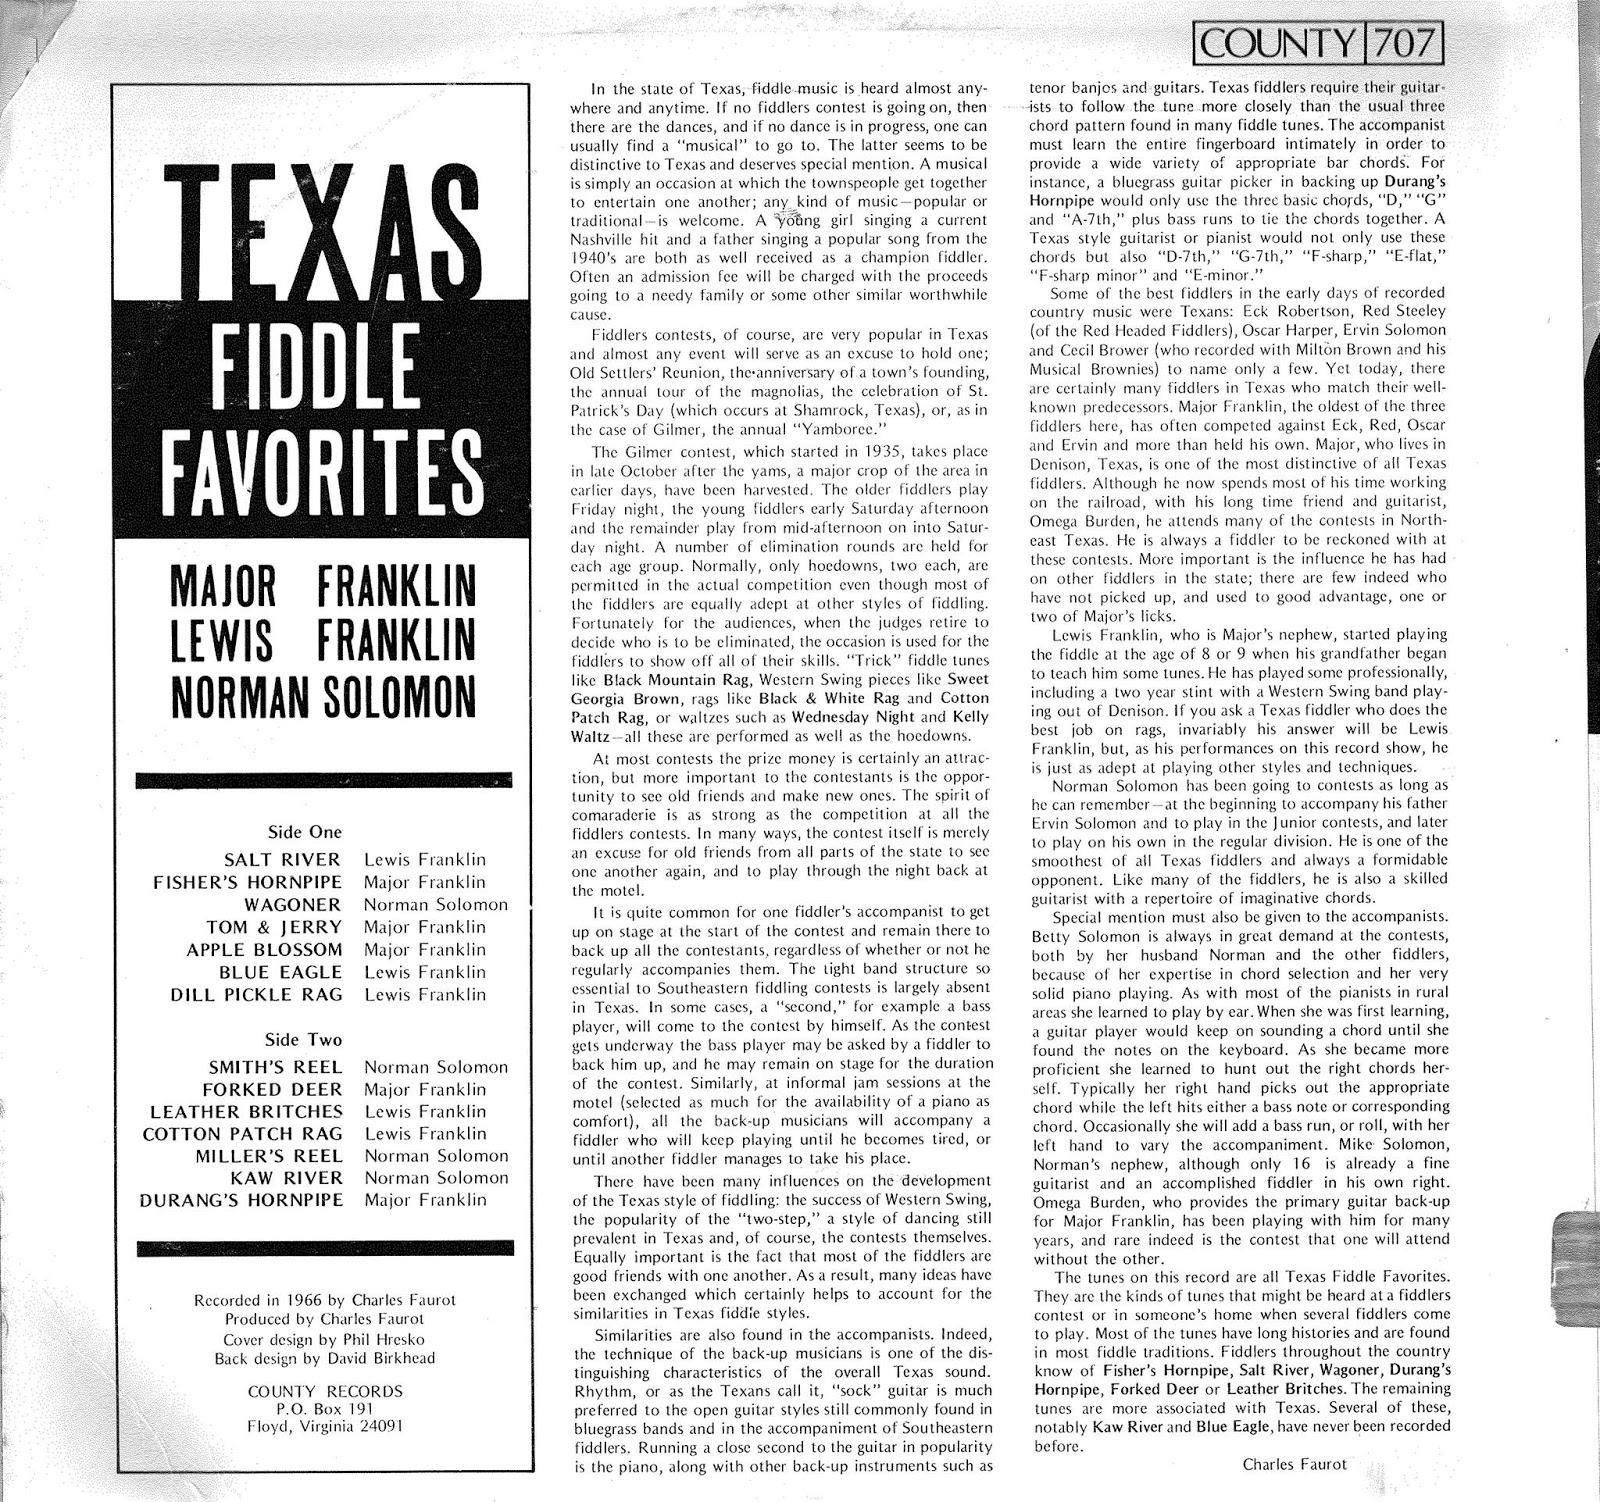 Texas Style Guitar Backup